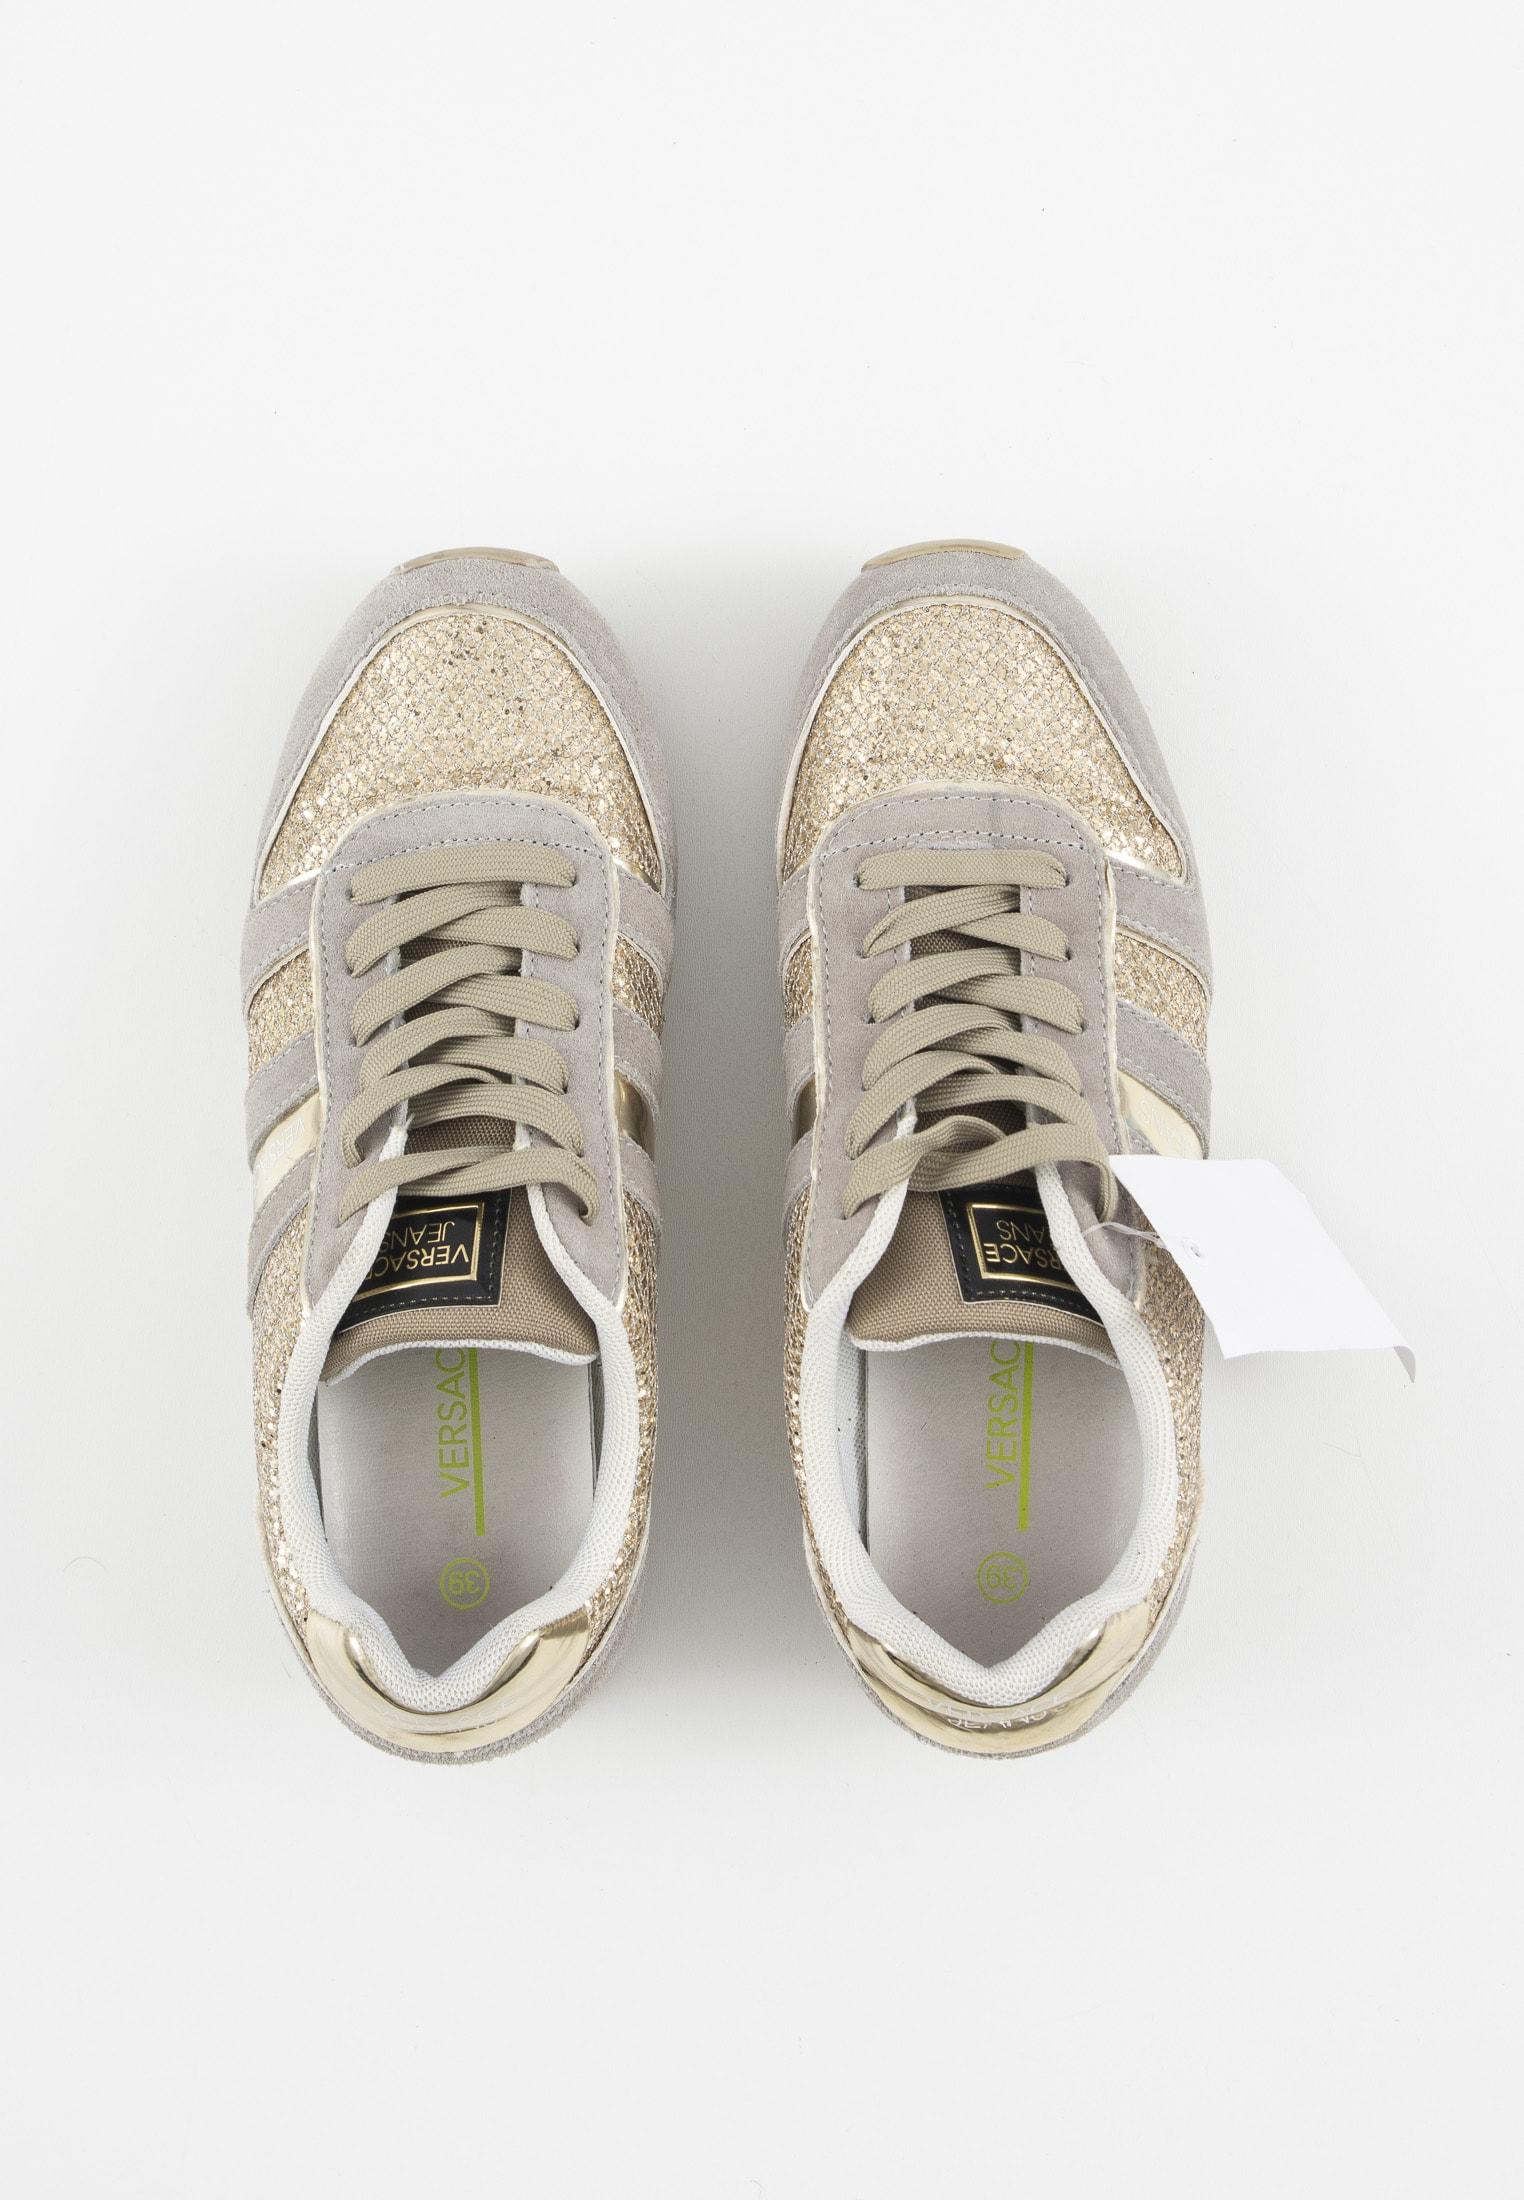 Versace Jeans Sneakers Beige Gr.39